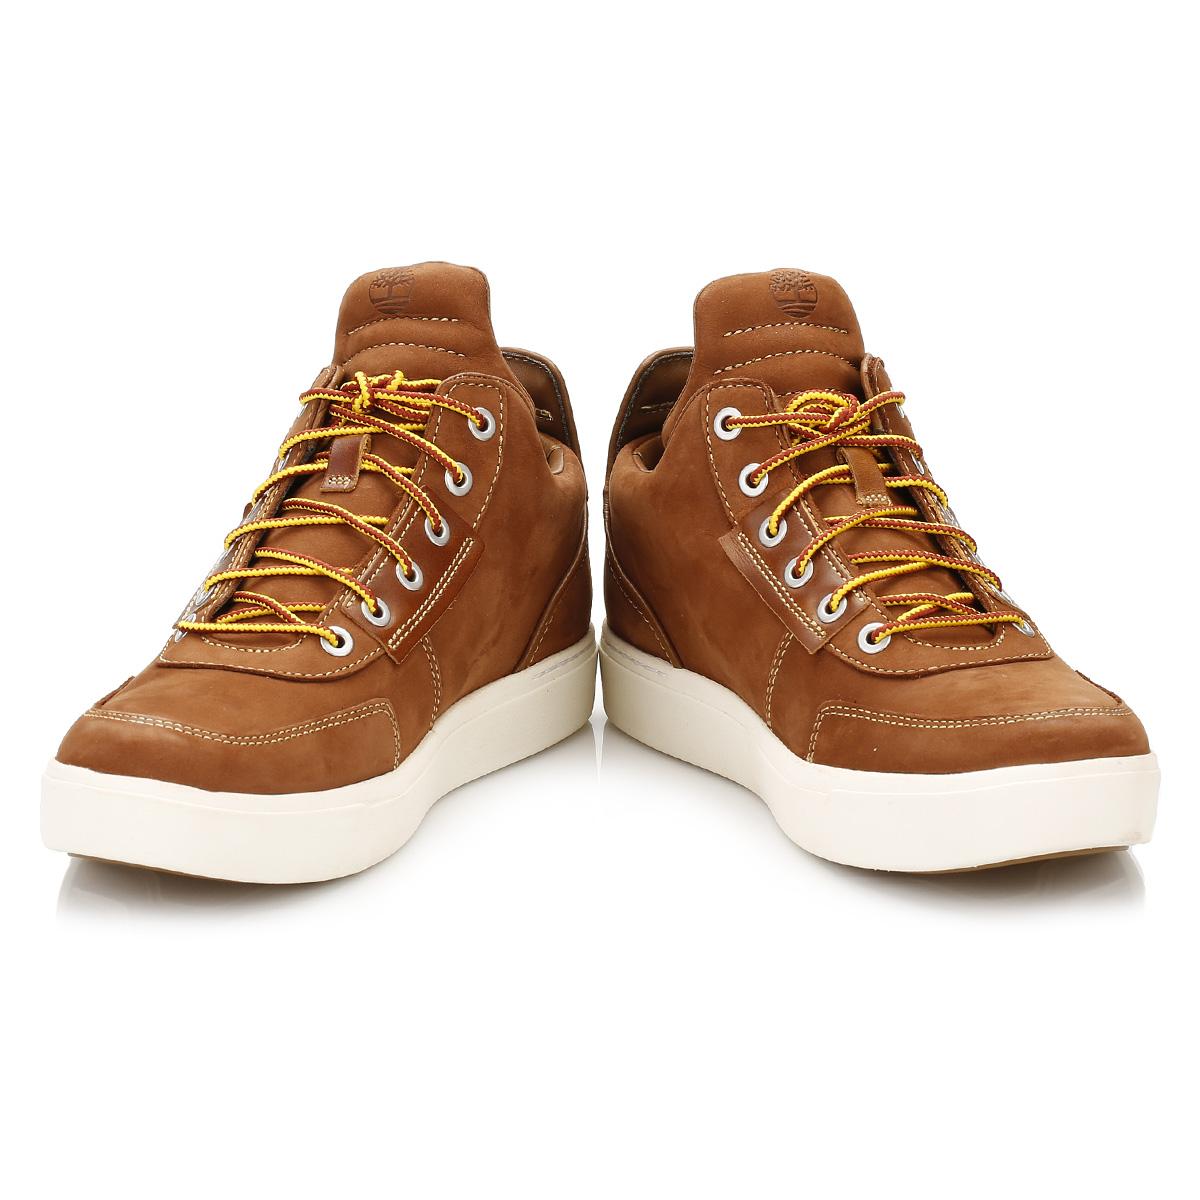 Timberlands-Mens-Amherst-High-Top-Chukka-Boots-Brown-